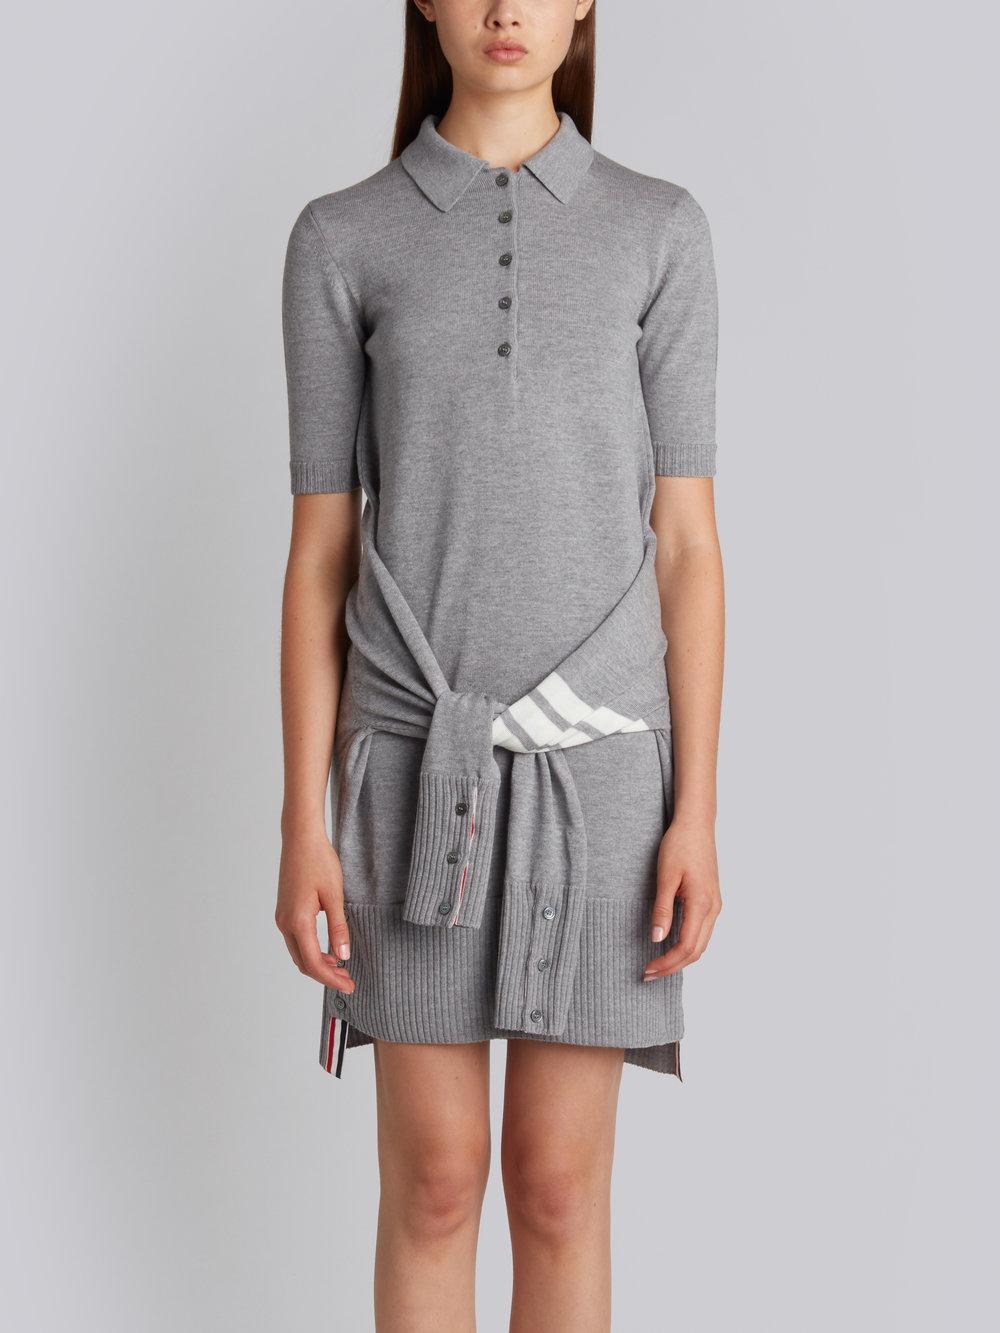 Polo dress Thom Browne lT8pmSH